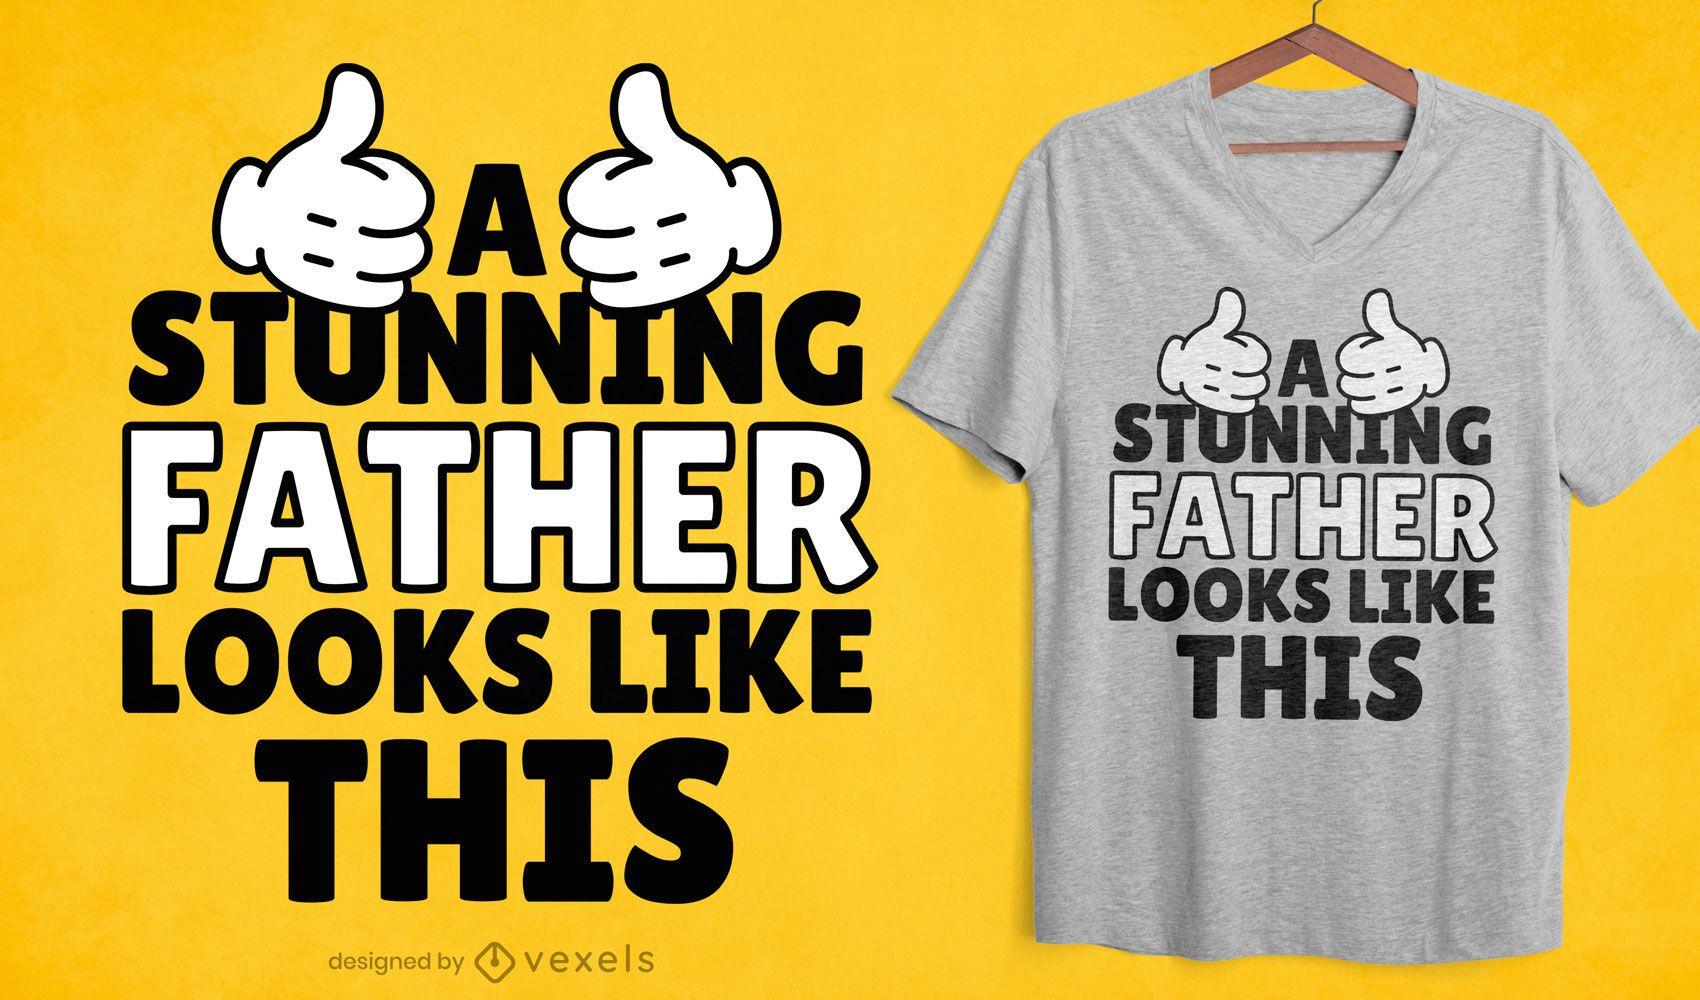 Stunning father t-shirt design